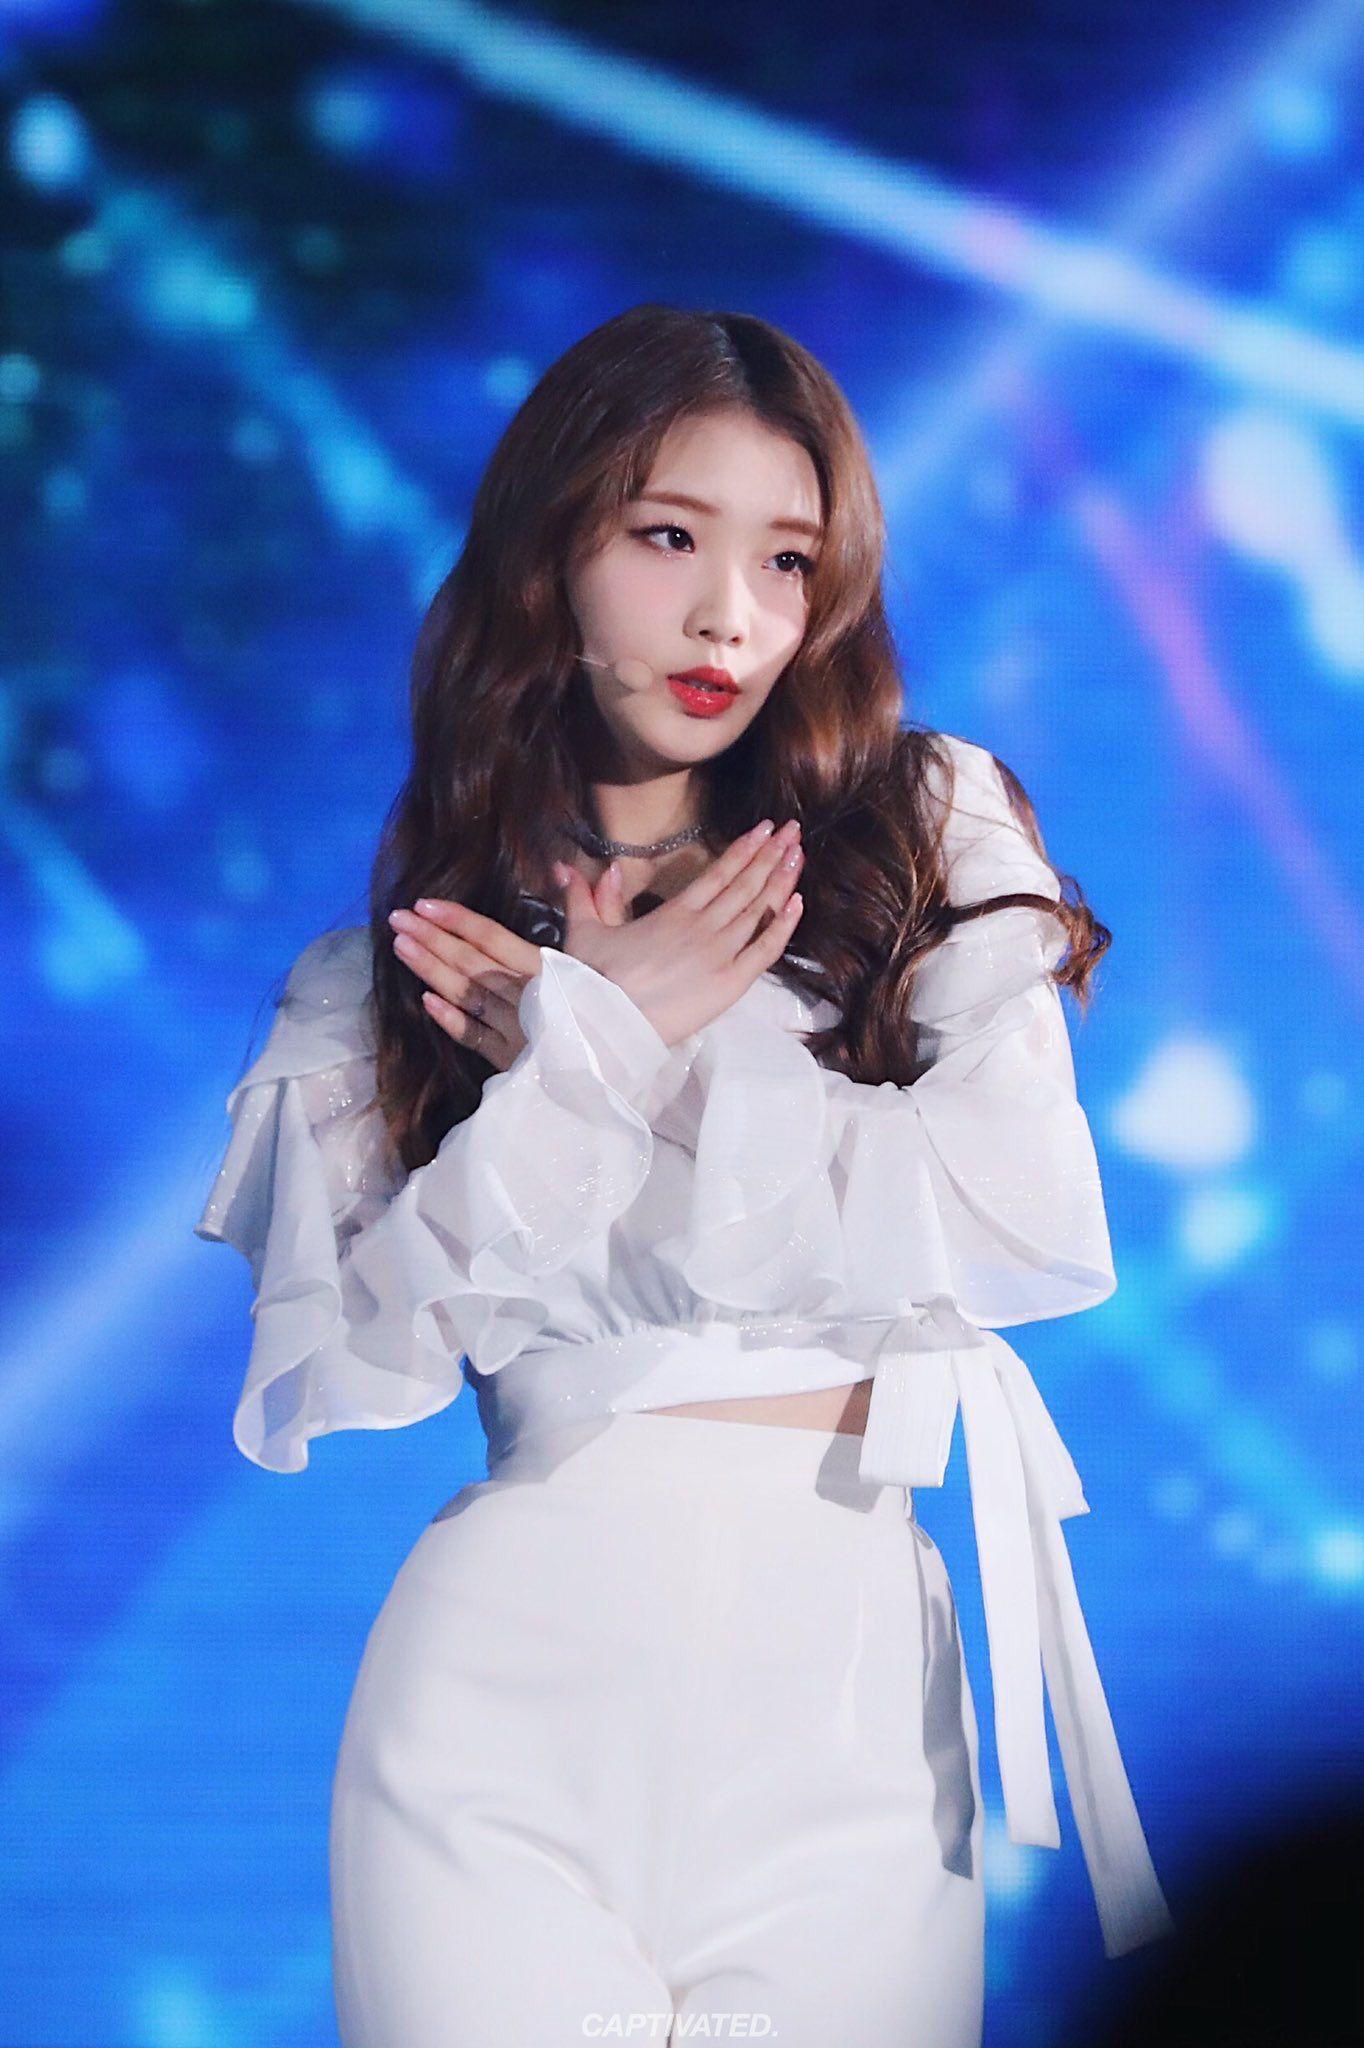 Pin By Petra On Loopd Kpop Girls Kpop Girl Groups Korean Girl